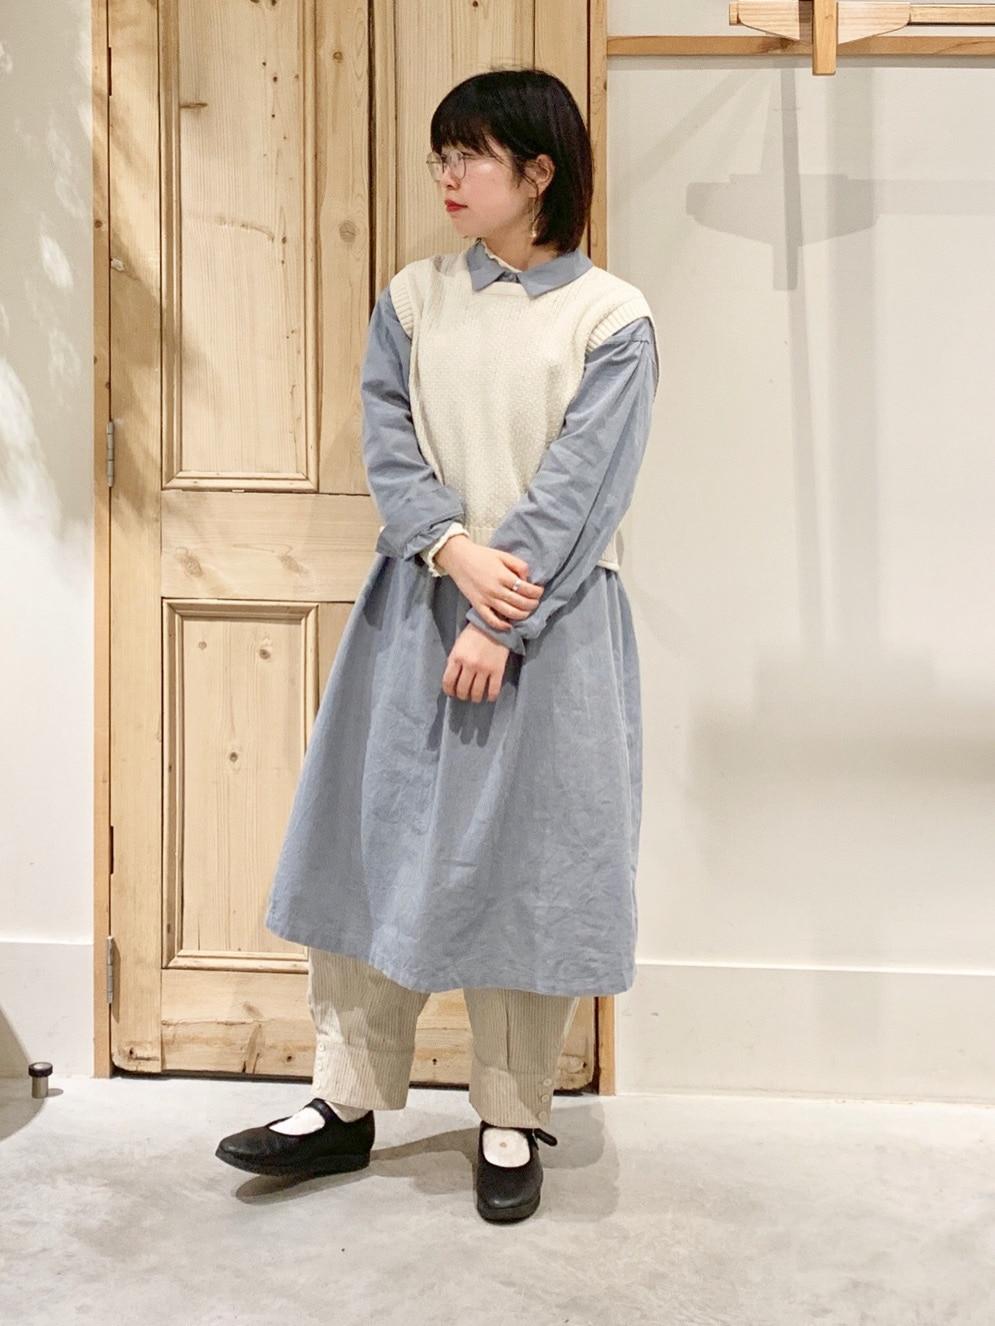 Malle chambre de charme 調布パルコ 身長:153cm 2021.02.14